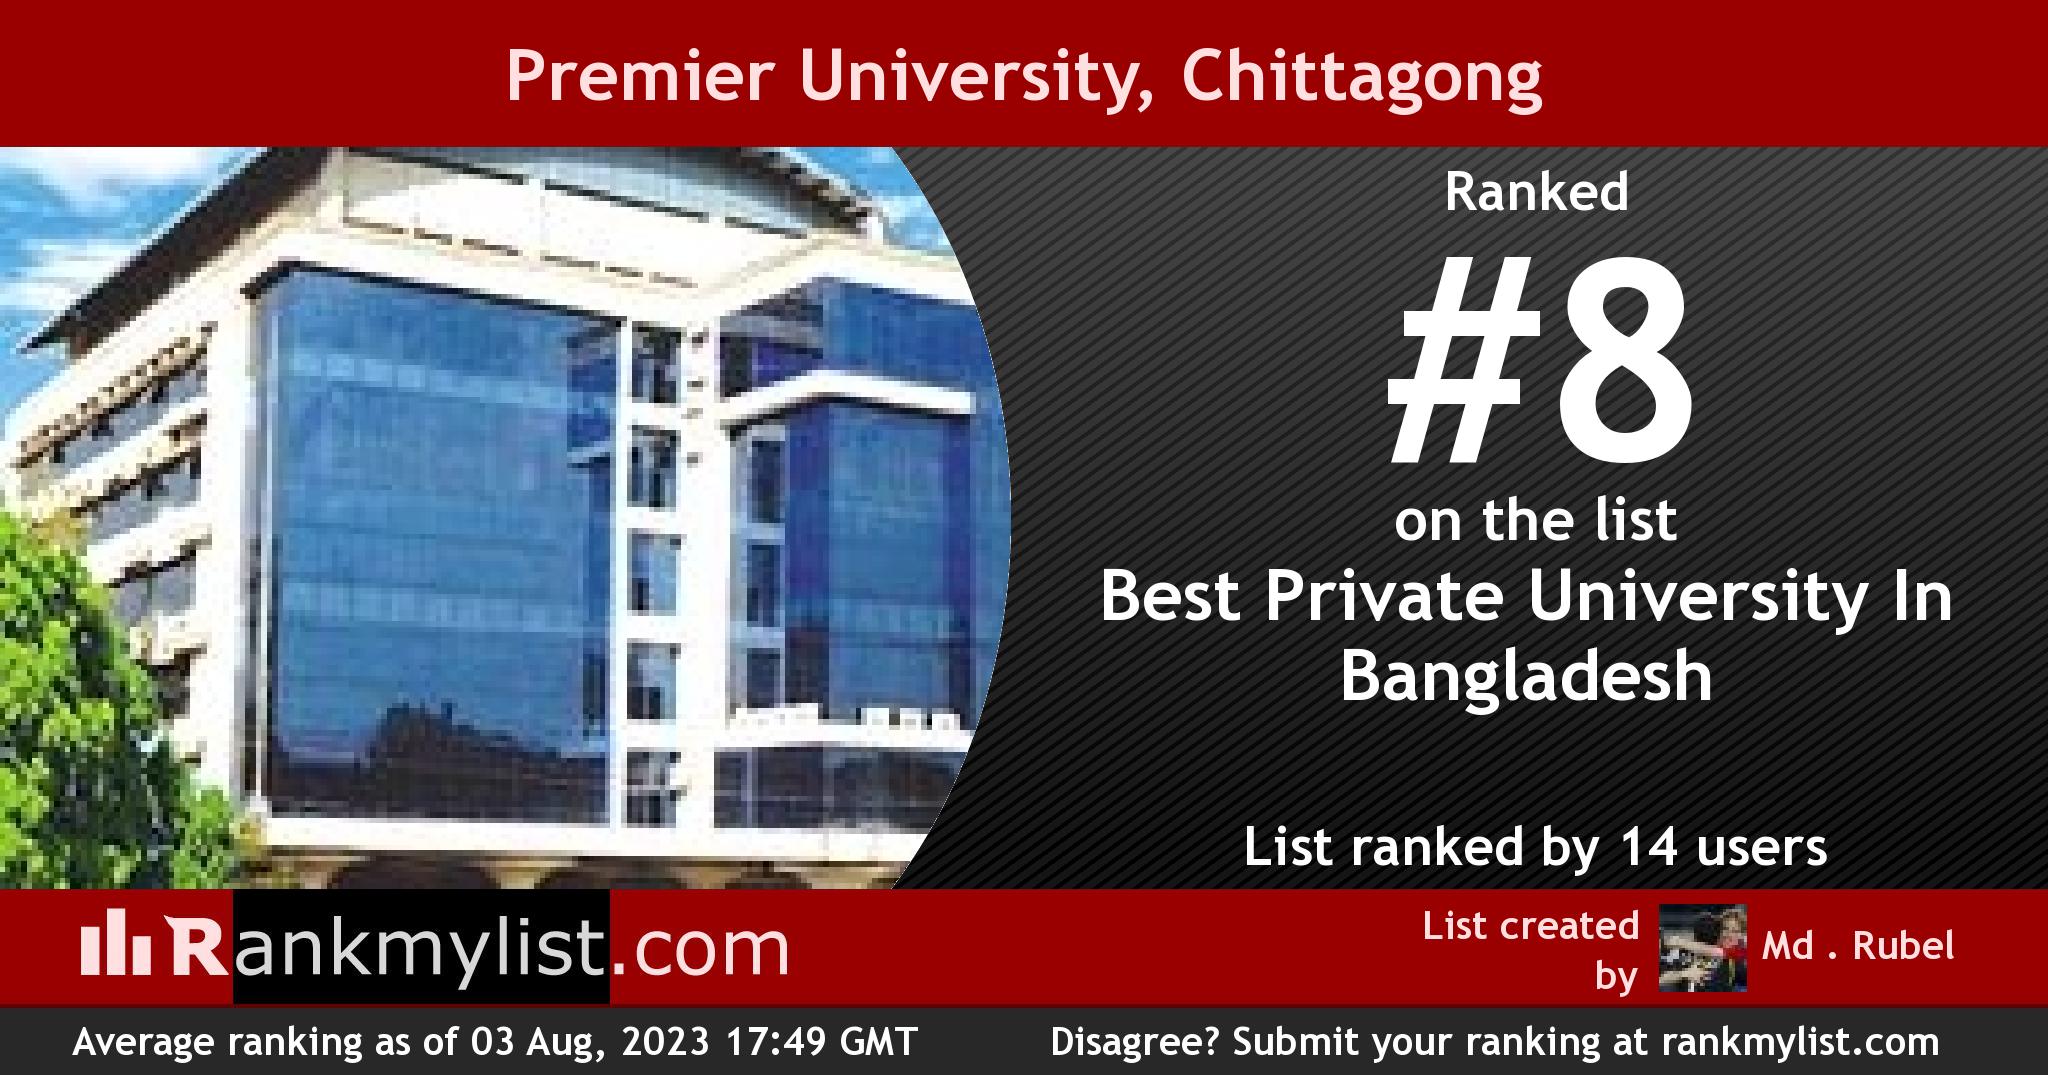 Best Private University In Bangladesh - Premier University